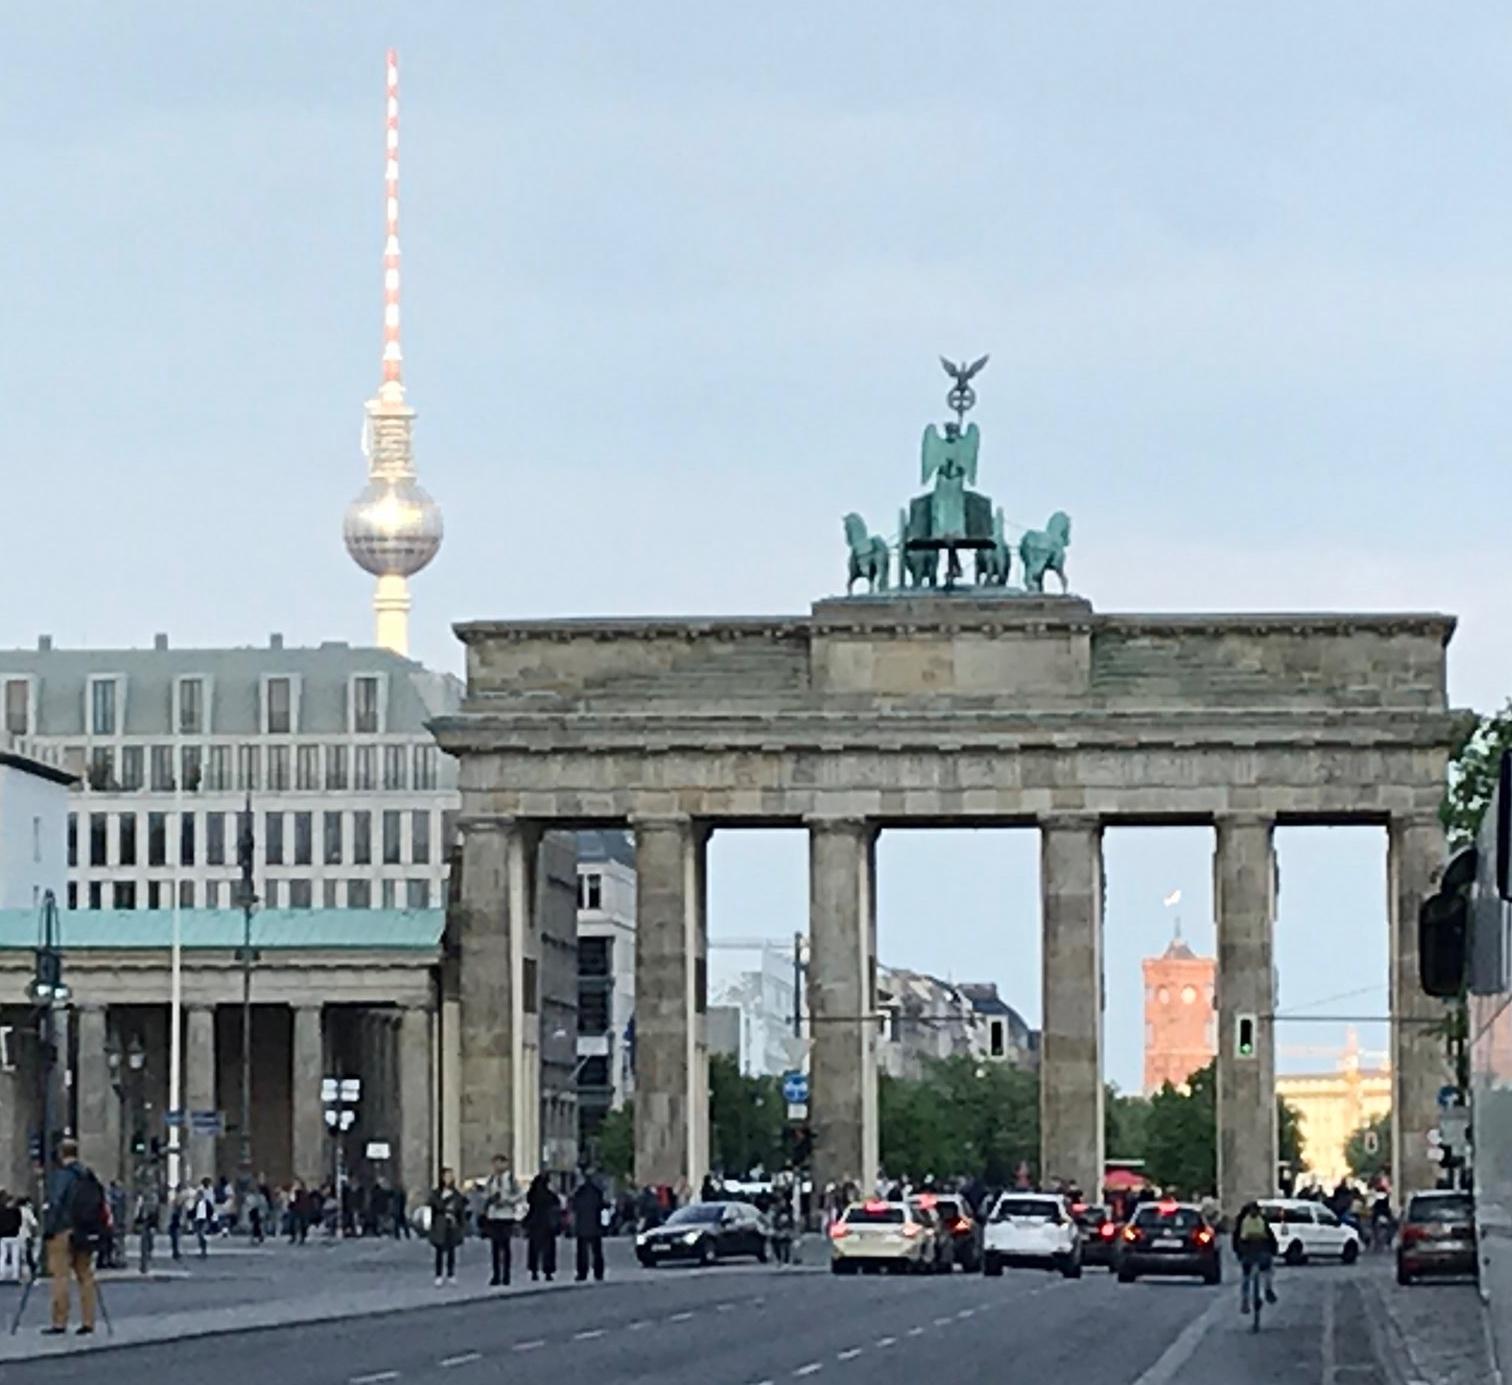 - Brandenberg Gate with the Fernsehturm behind